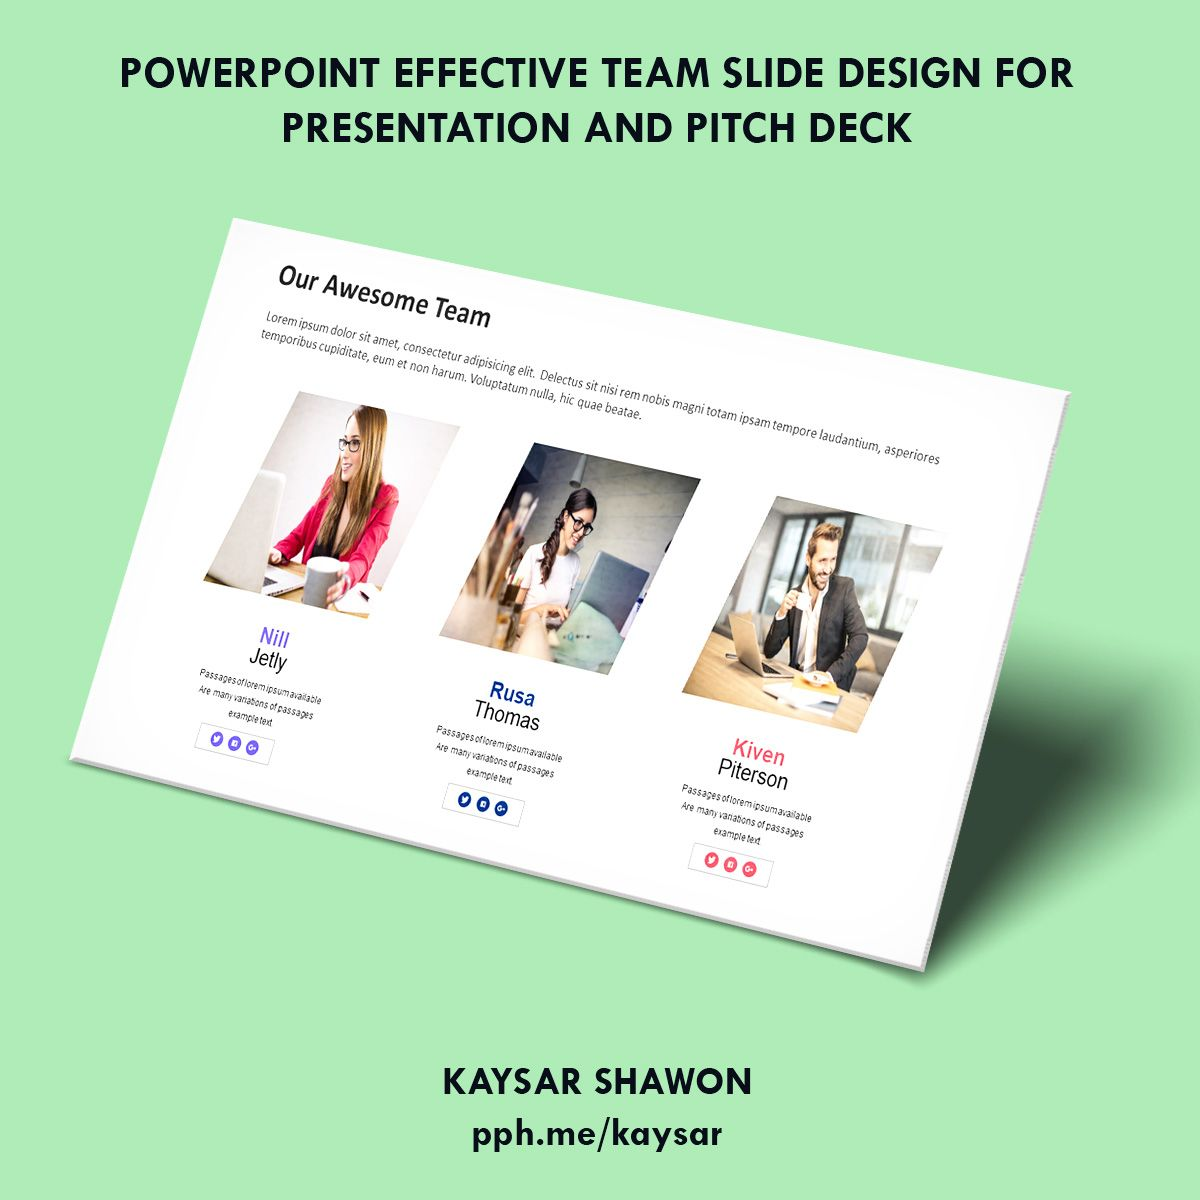 Effective team slide design for powerpoint presentation, pitch deck